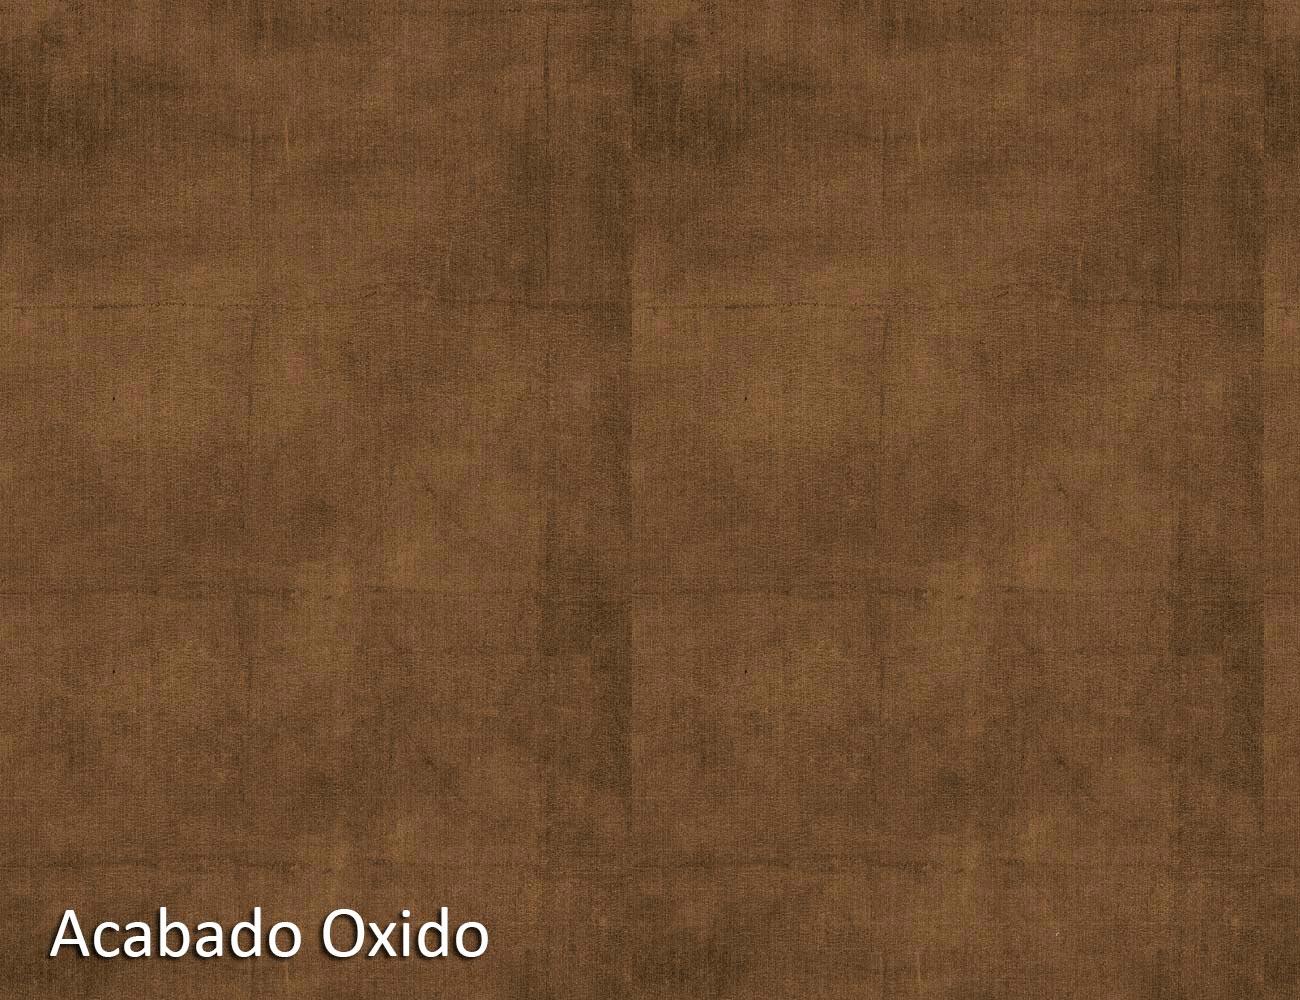 Acabado oxido1